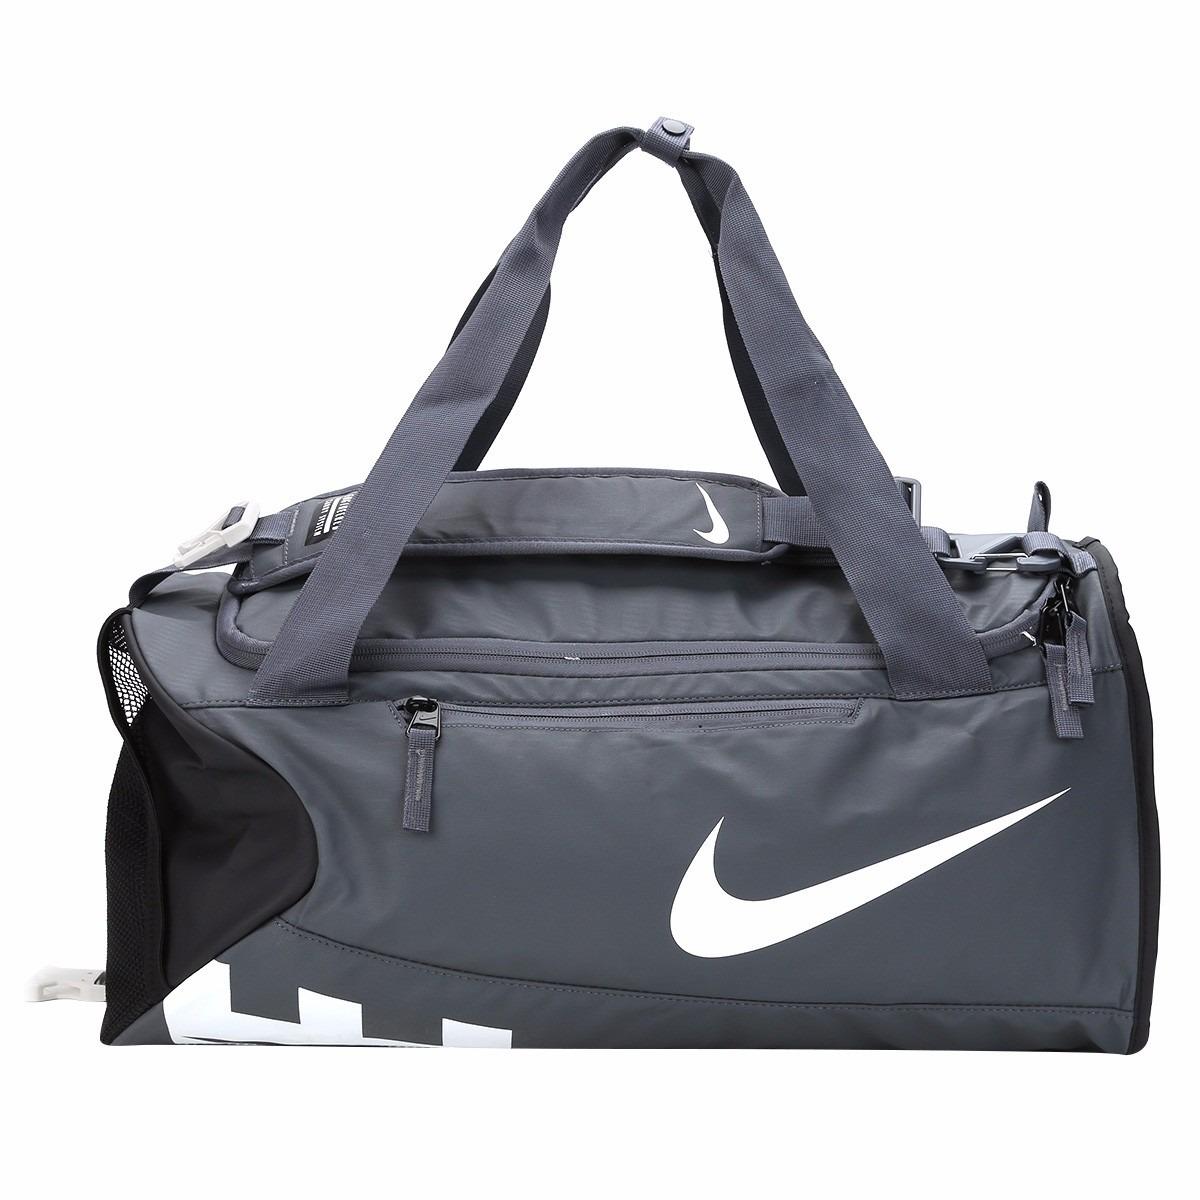 984fe5332 Bolsa Nike Alpha Adapt Crossbody Duffel Cinza 37l - R$ 169,00 em ...